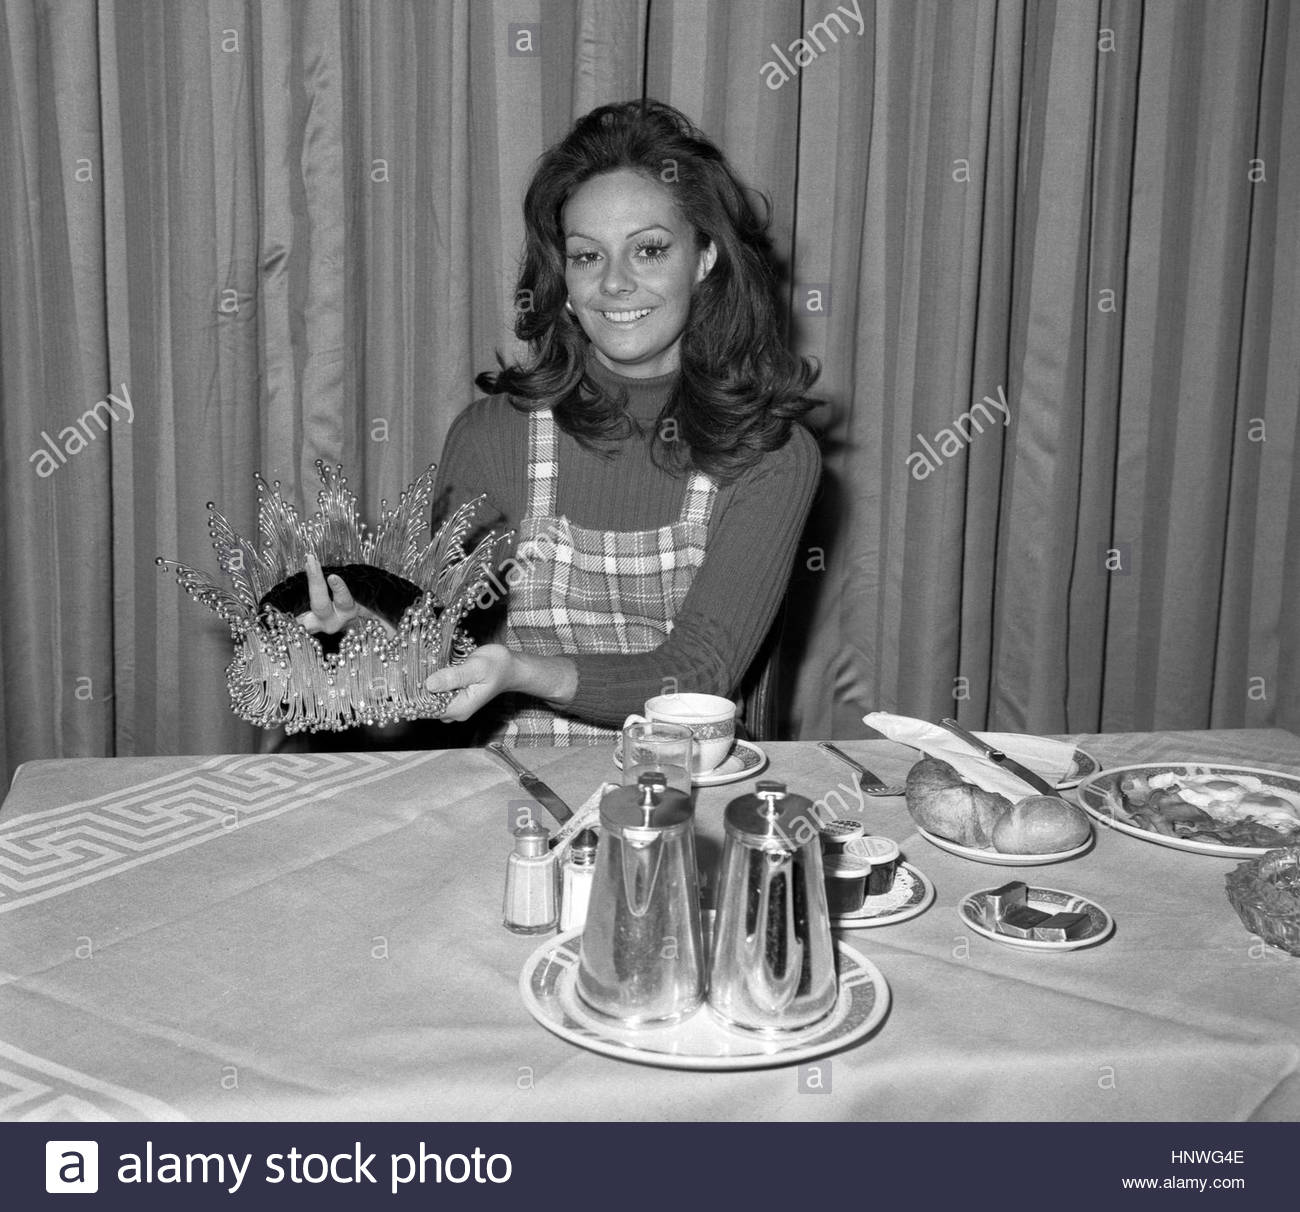 "˜*•. ˜""*°•.˜""*°••°* Lucia Petterle, Miss World 1971. ˜*•. ˜""*°•.˜""*°••°* - Página 2 Kkg6jnav"